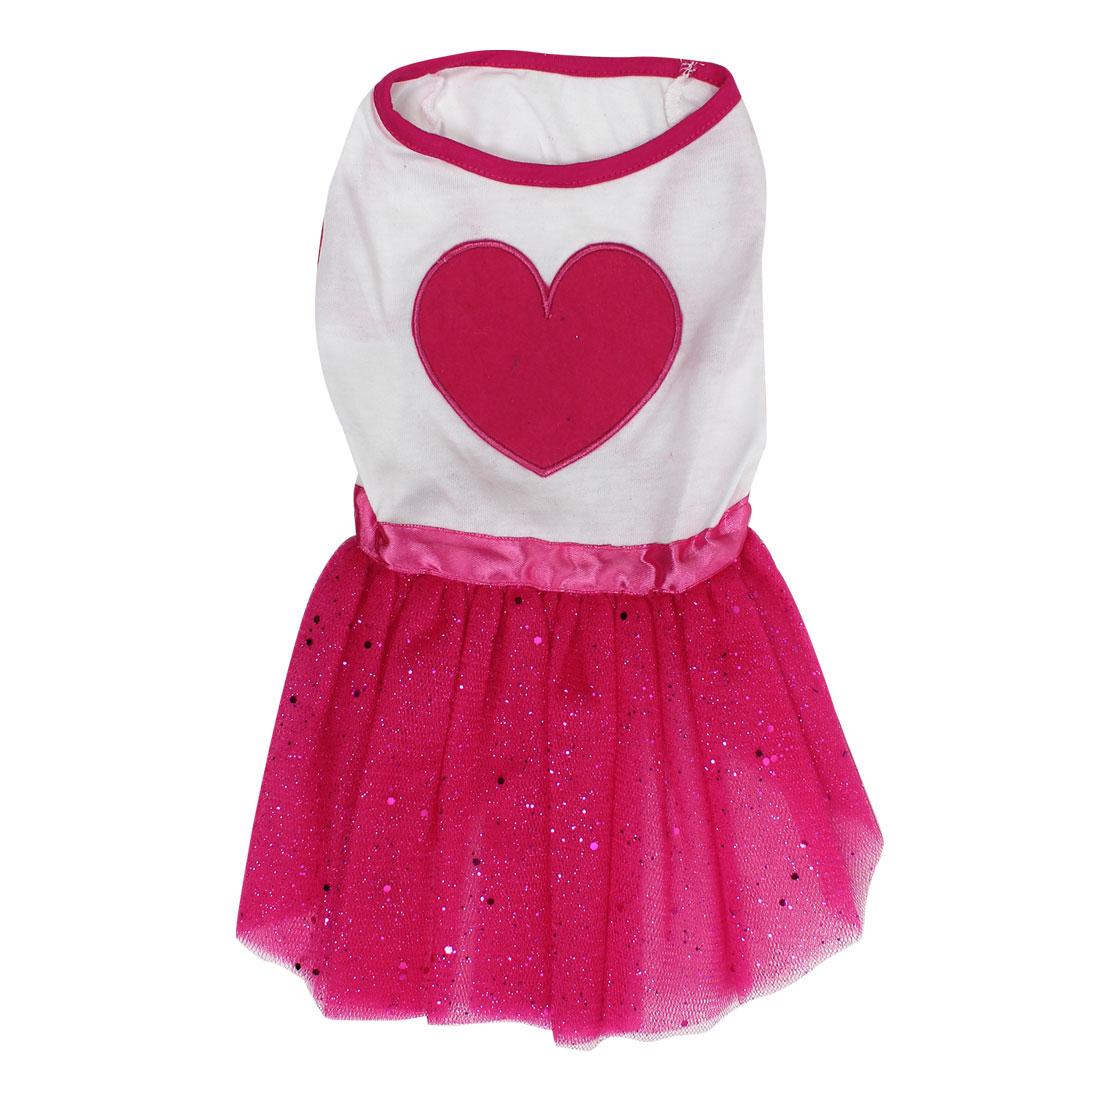 Pet Dog Doggie Heart Shaped Pattern Summer Ballet Dress Skirt White Red Size M